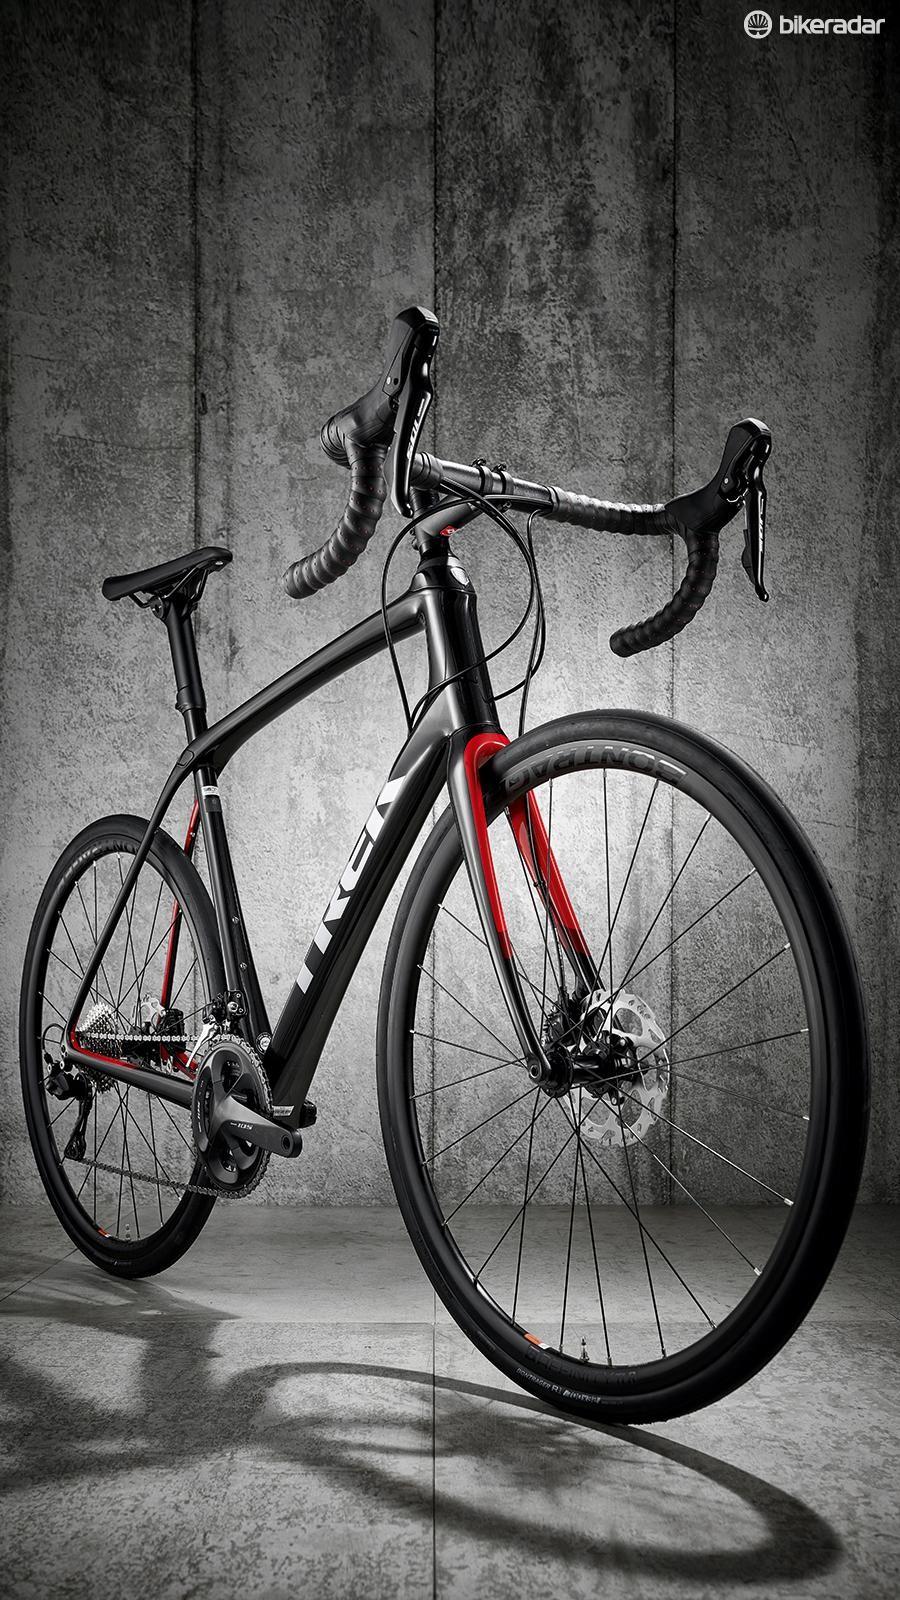 Trek Domane SL 5 Disc review - BikeRadar